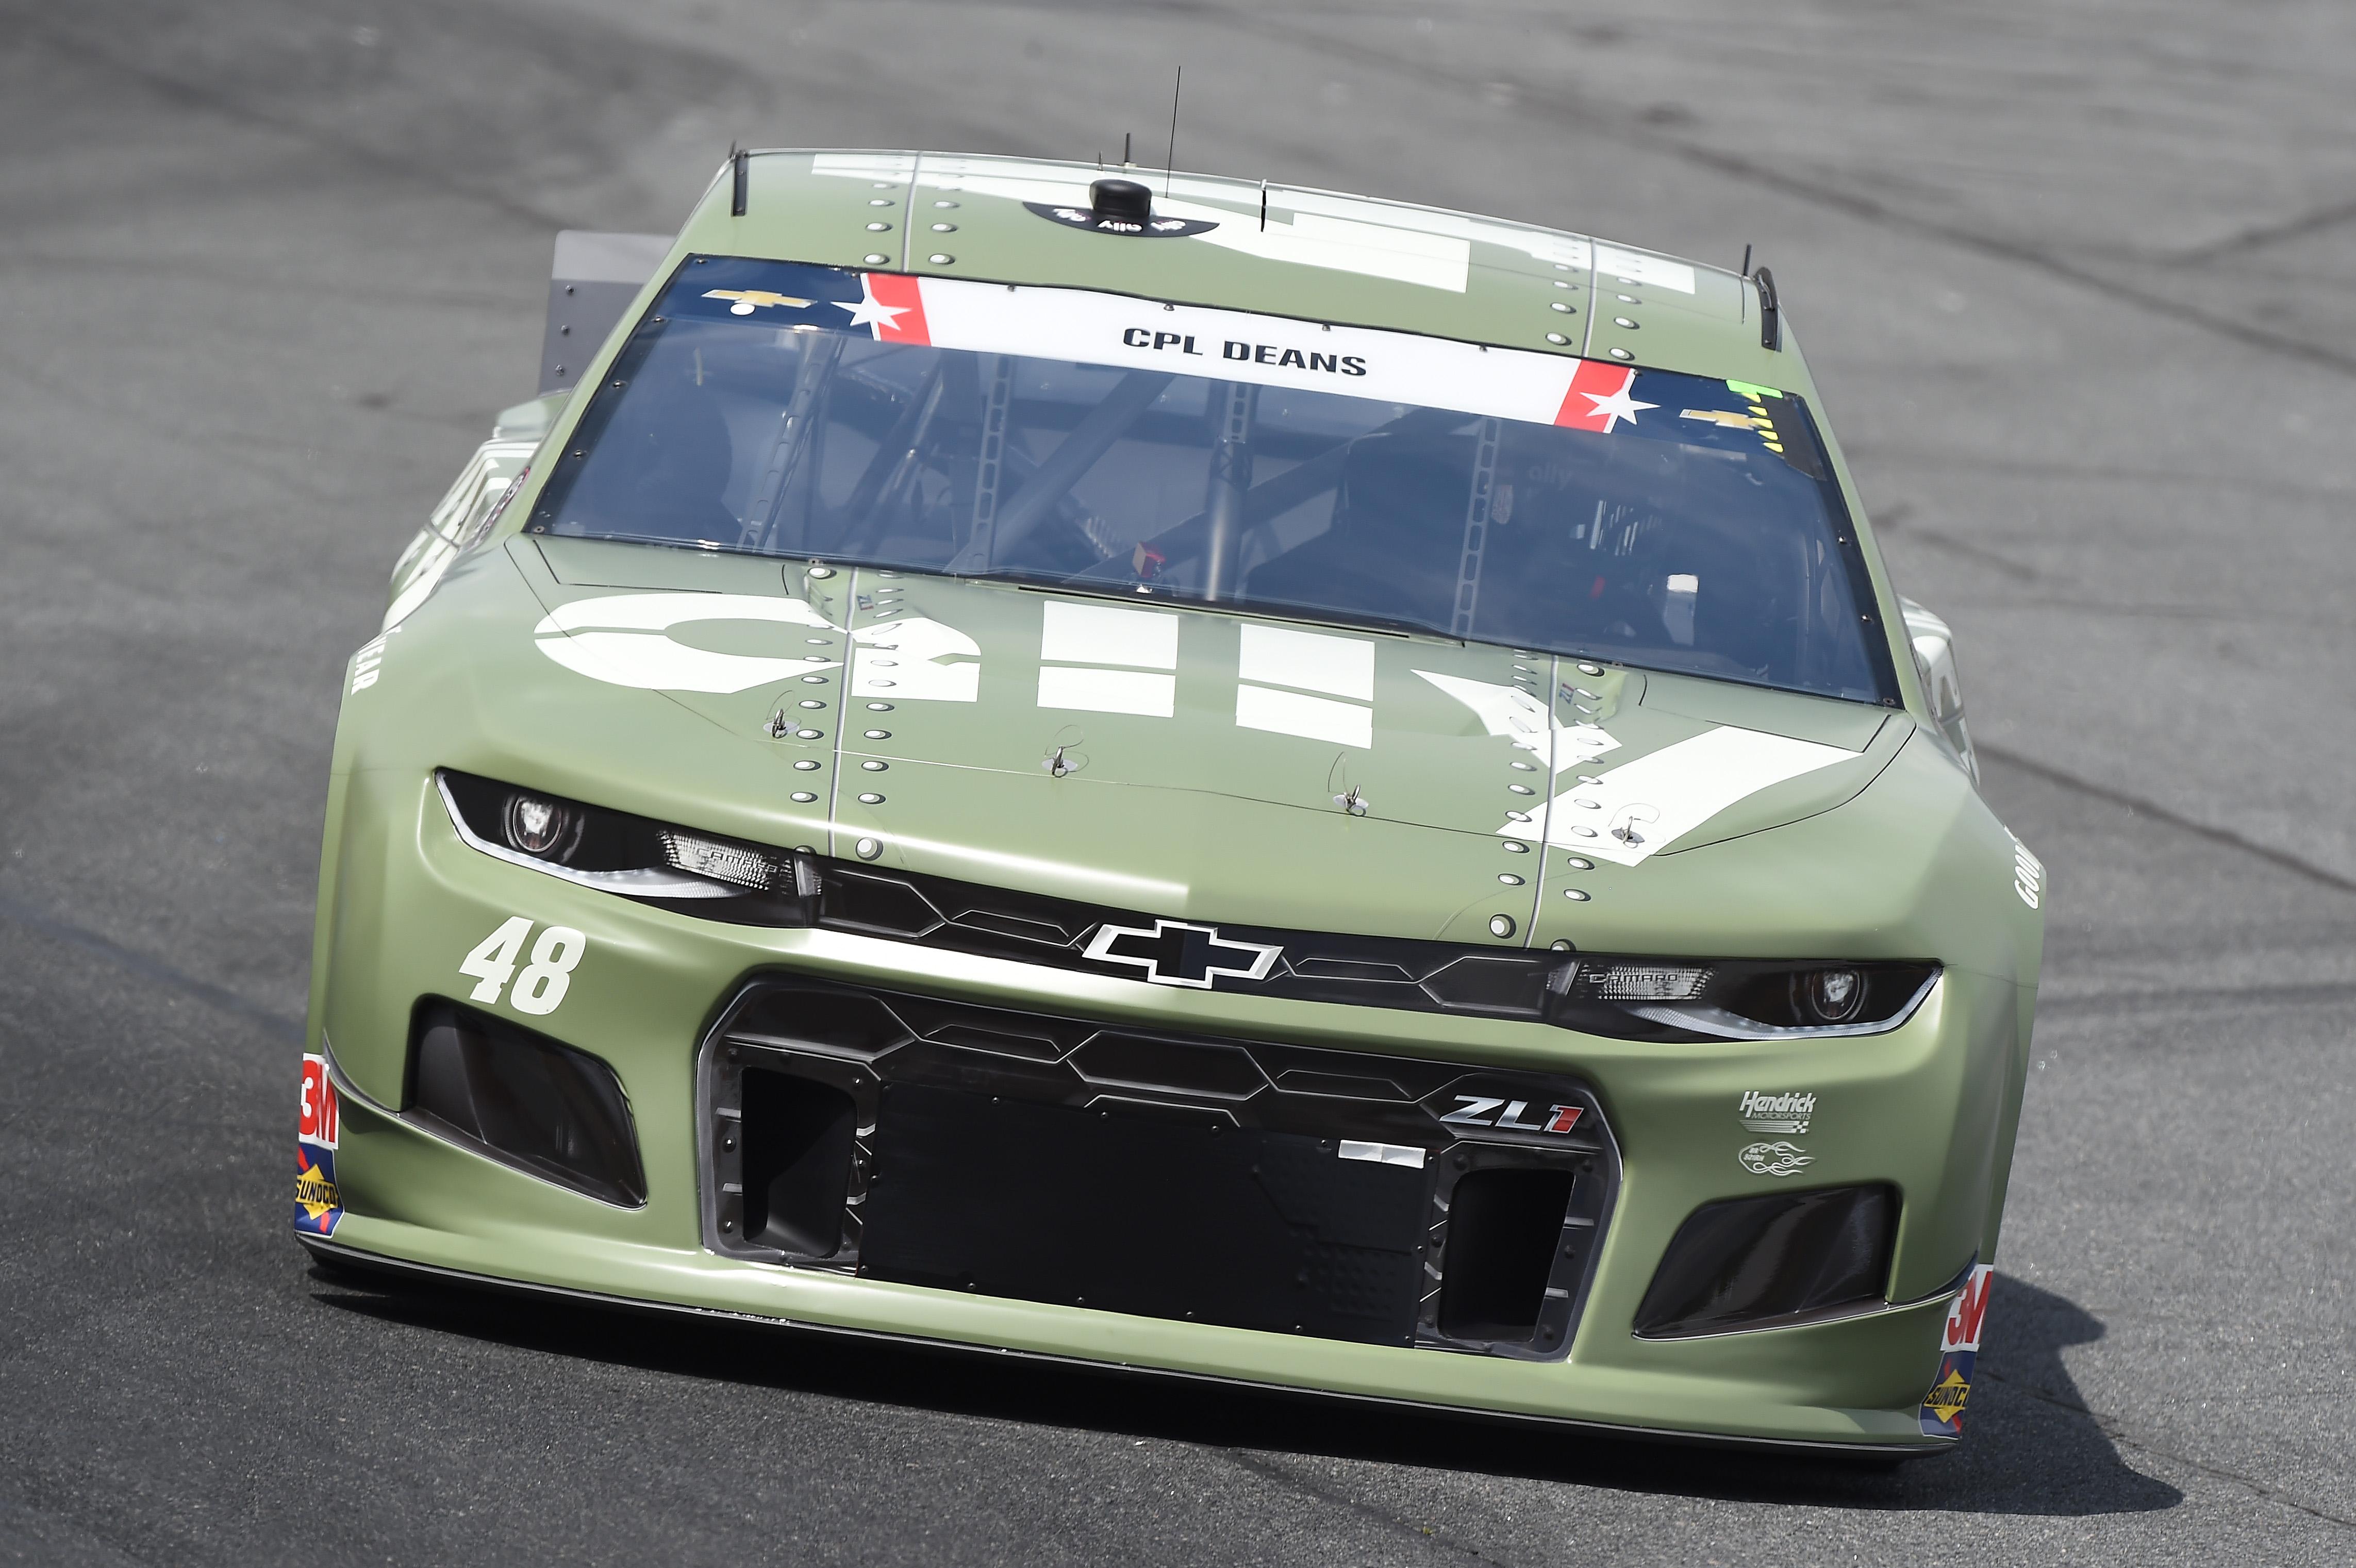 Jimmie Johnson Hendrick Chevrolet NASCAR 2020